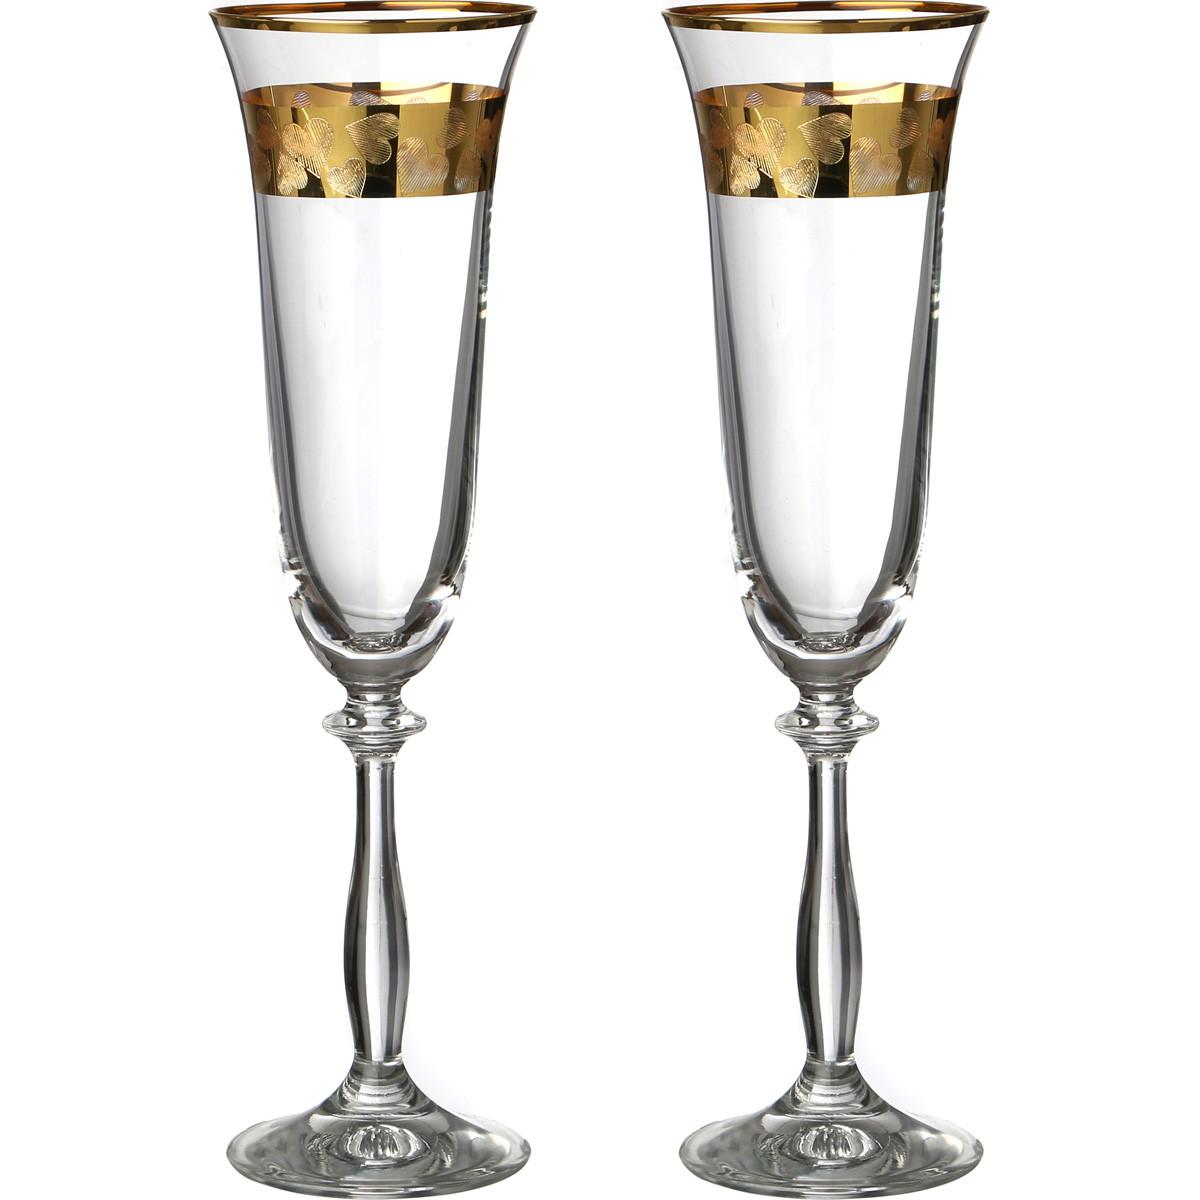 {} Bohemia Crystal Набор бокалов для шампанского Allister (25 см - 2 шт) bohemia crystal набор бокалов для шампанского felina 25 см 2 шт